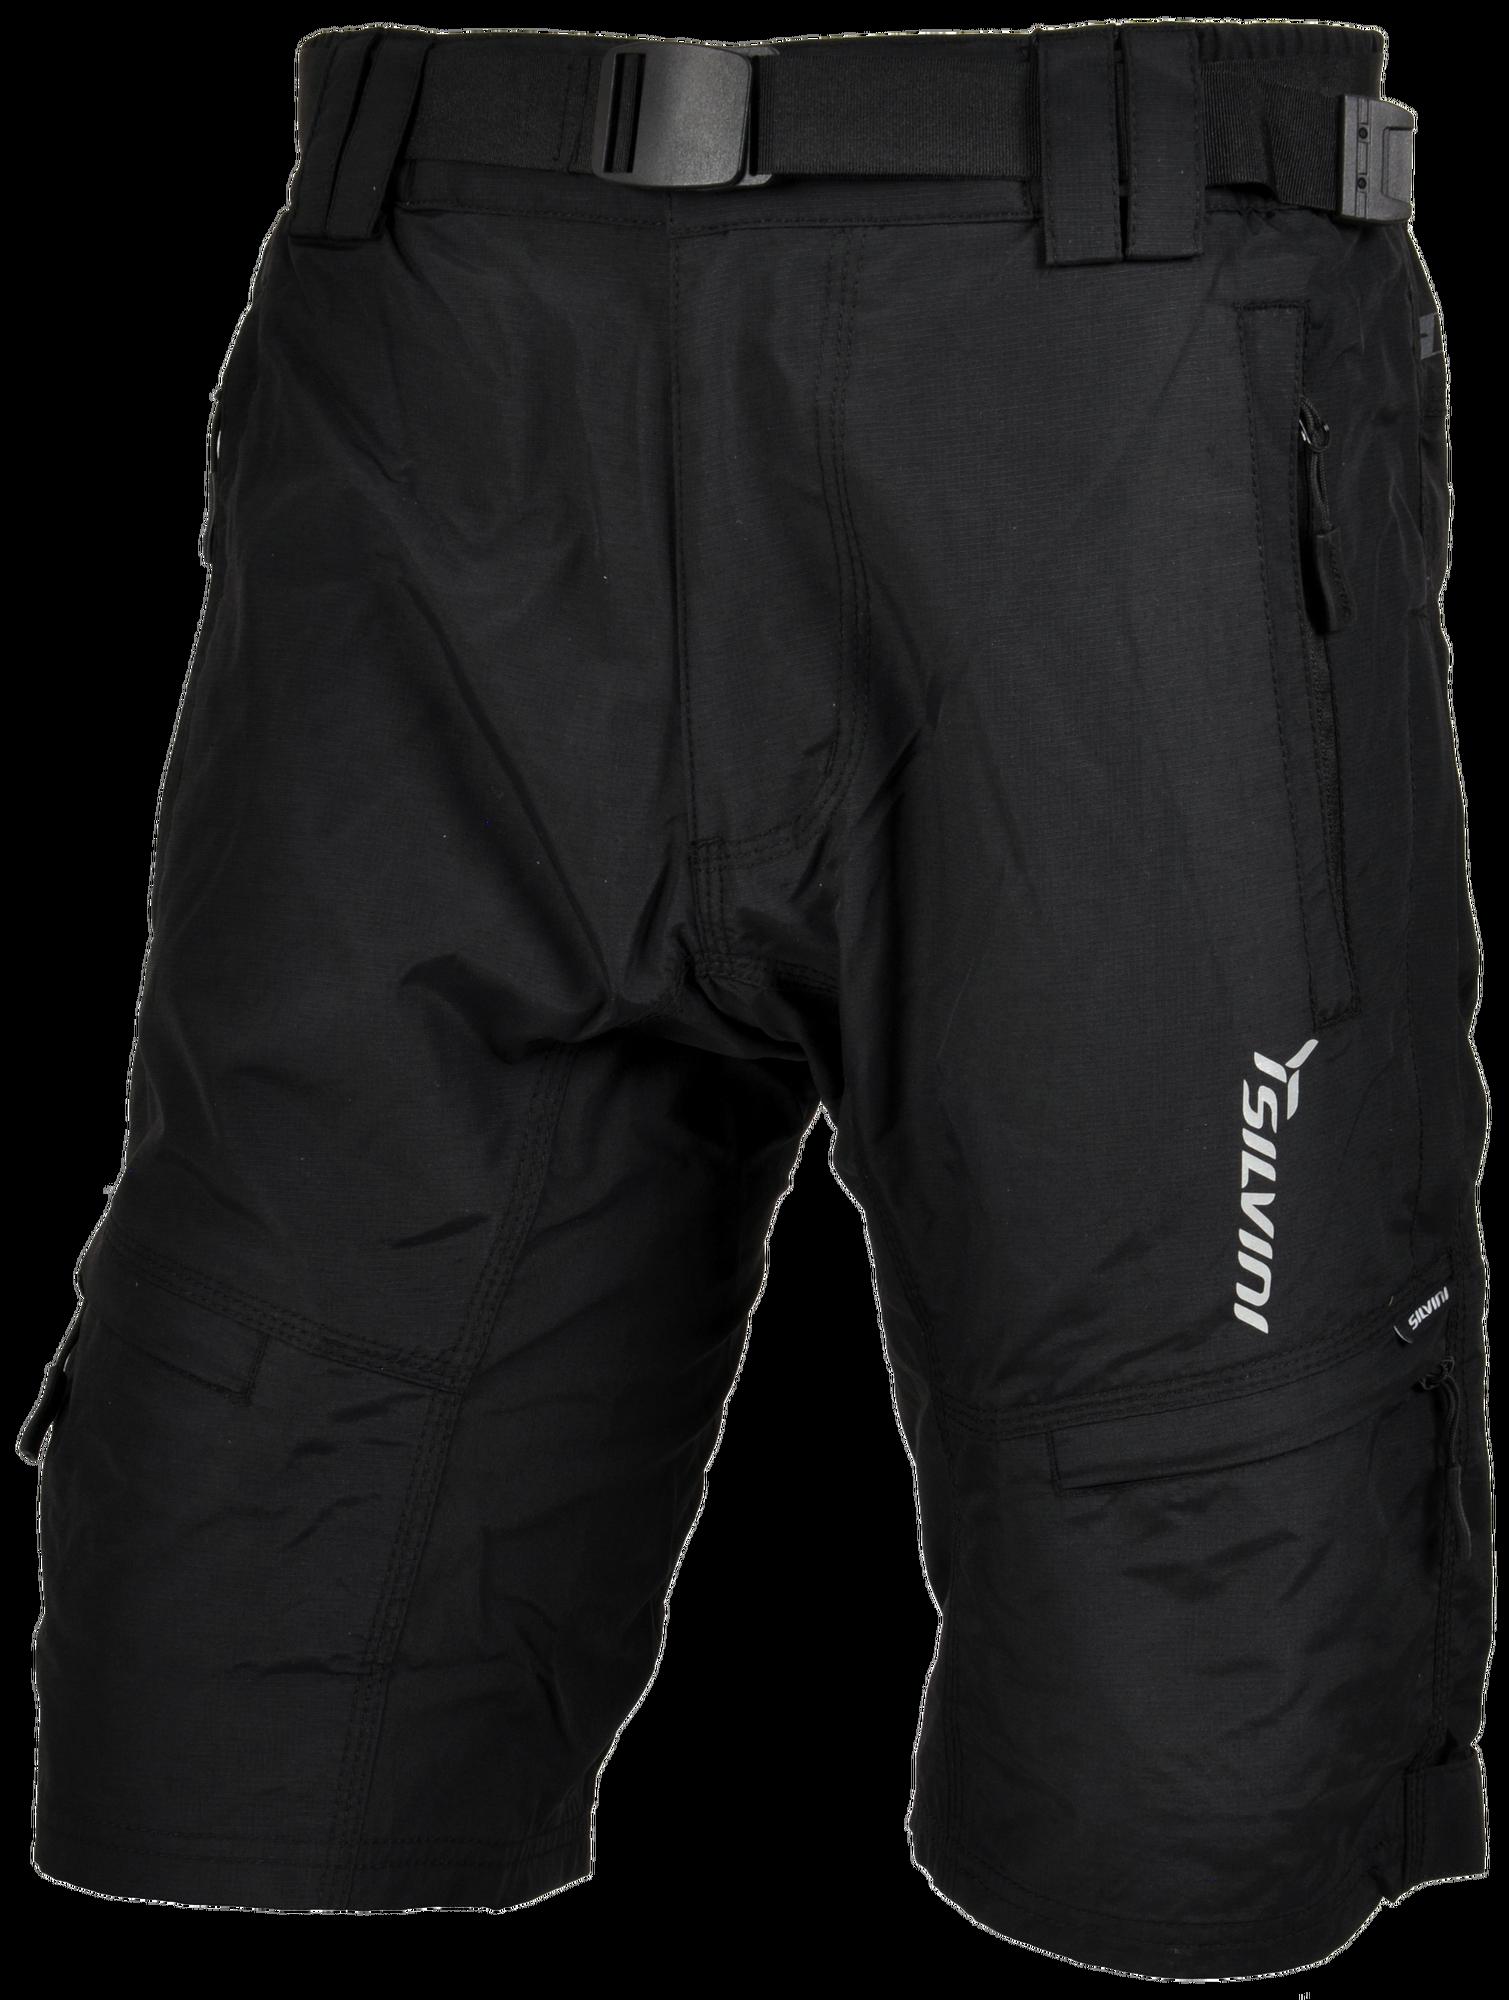 Pánské cyklistické kalhoty Silvini MTB RANGO MP857 bez cyklovložky Inner  černé 124326f02d